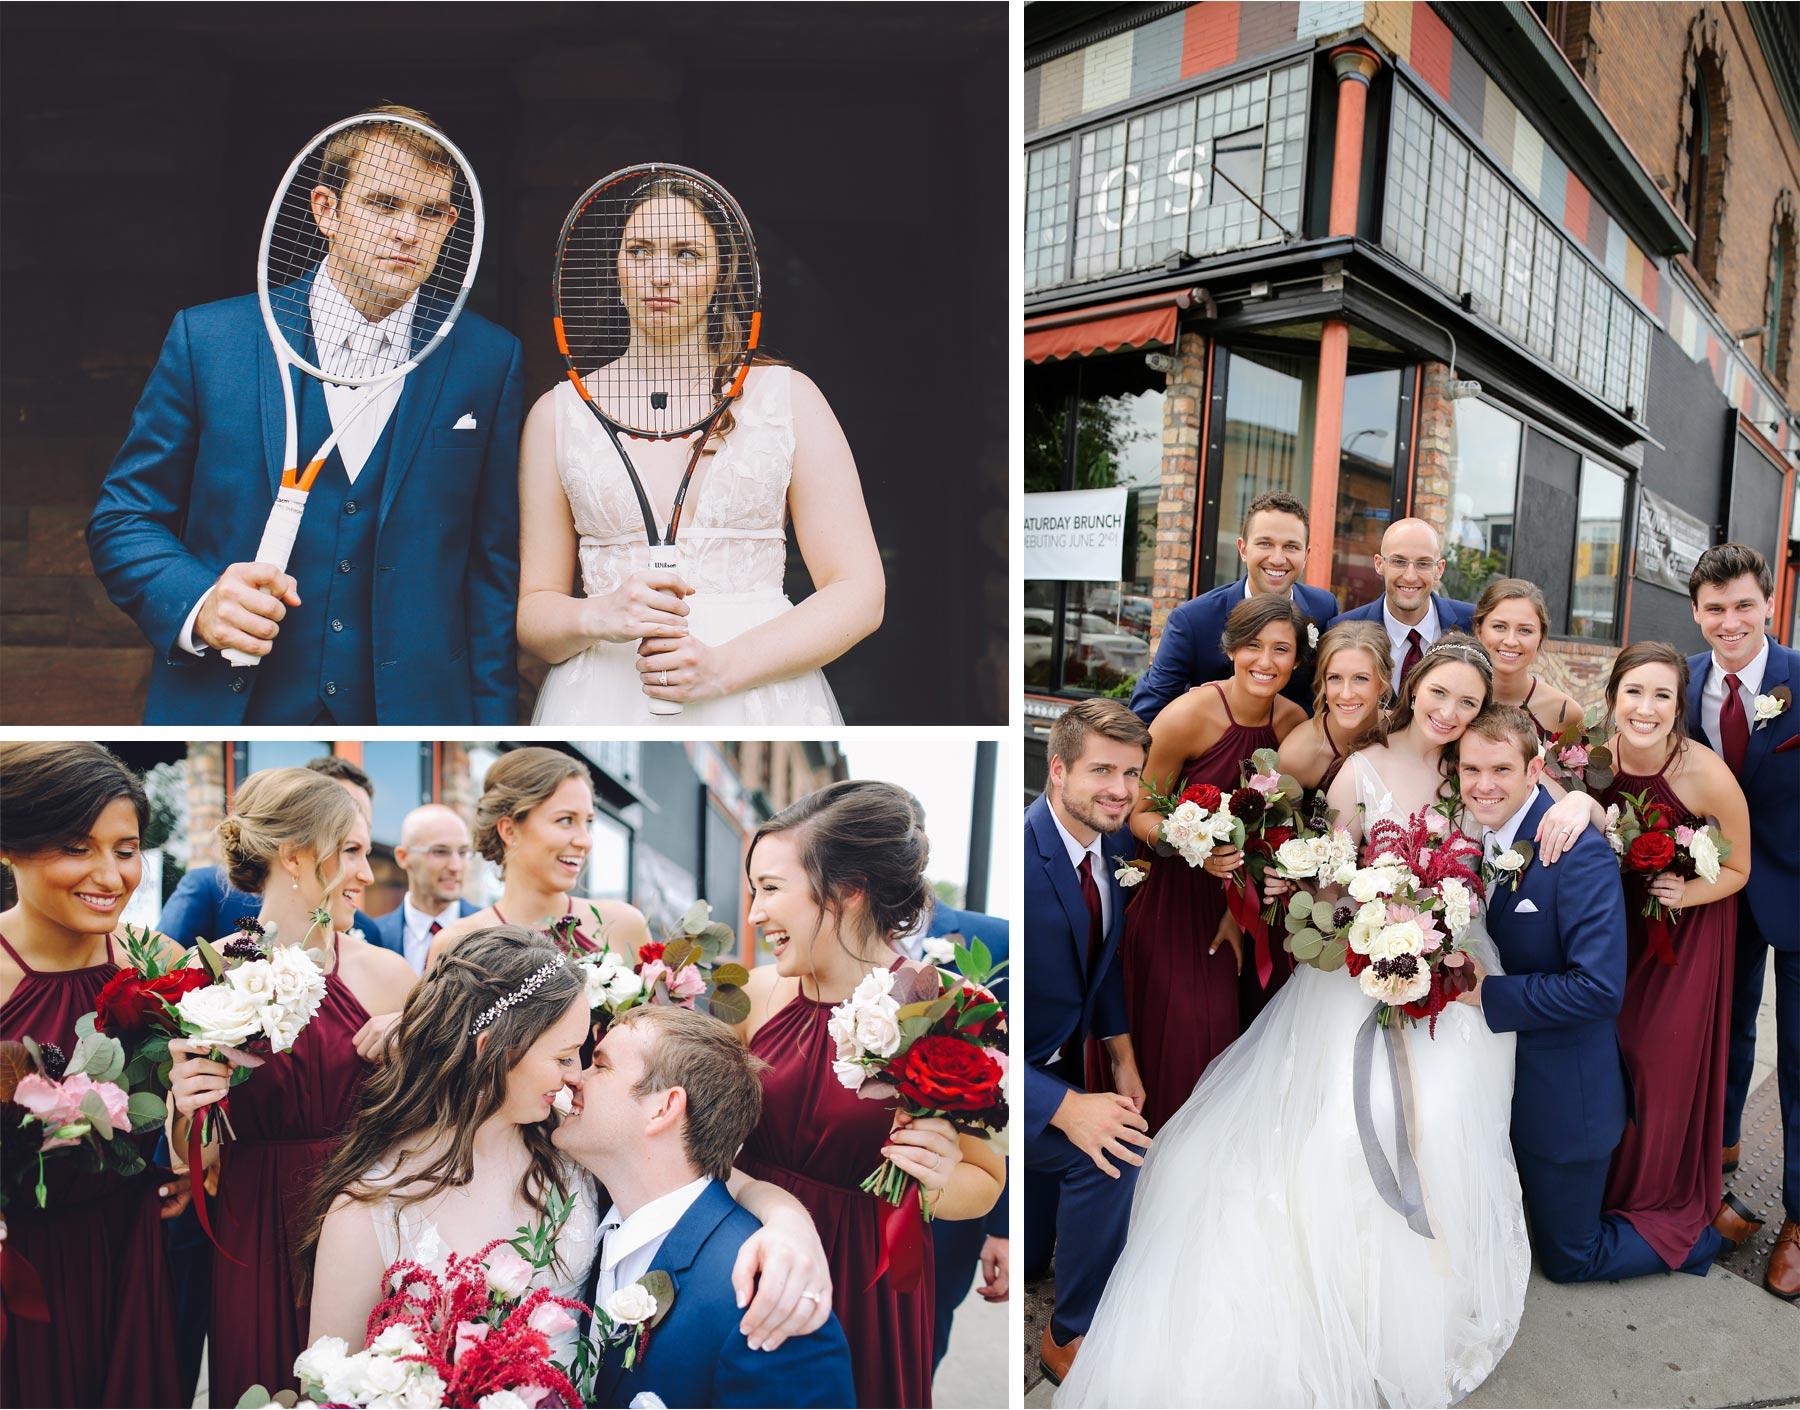 10-Saint-Paul-Minnesota-Wedding-Photography-by-Vick-Photography-Saint-Paul-Athletic-Club-Tennis-Group-Wedding-Party-Kelsey-and-Jeffery.jpg